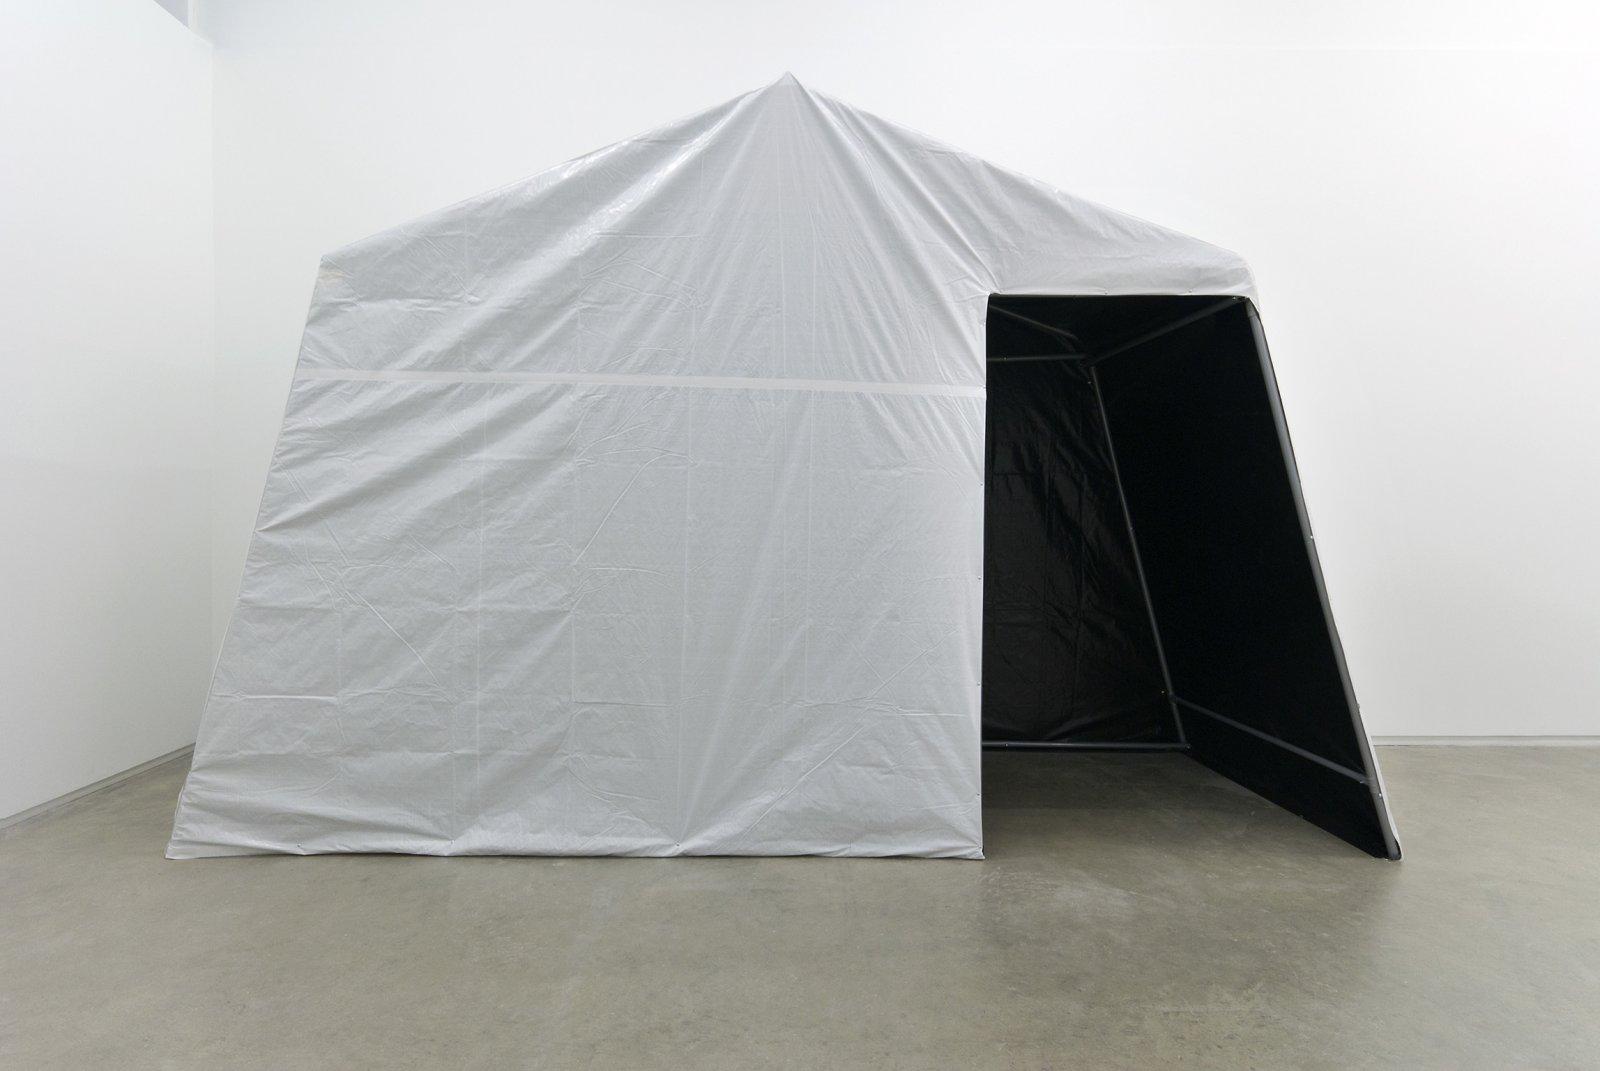 Kevin Schmidt, Temporary Lightlock, 2010, tarp, portable garage frame, 189 x 259 x 105 in. (480 x 658 x 267 cm) by Kevin Schmidt